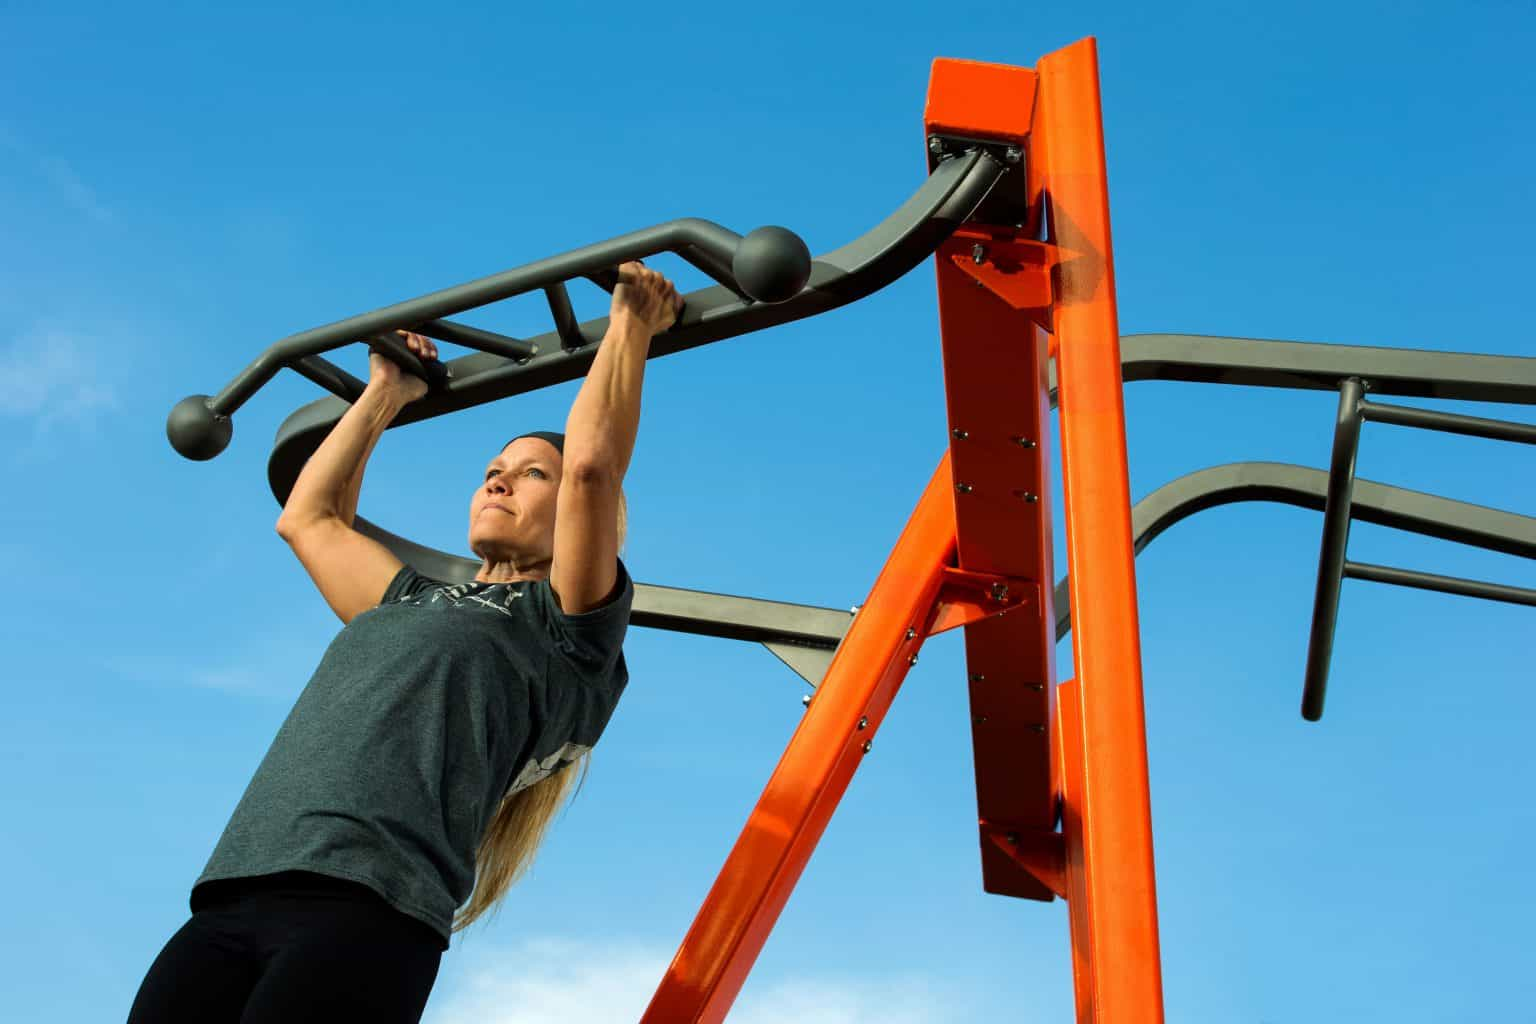 outdoor-fitness-equipment_49644066837_o-1536x1024